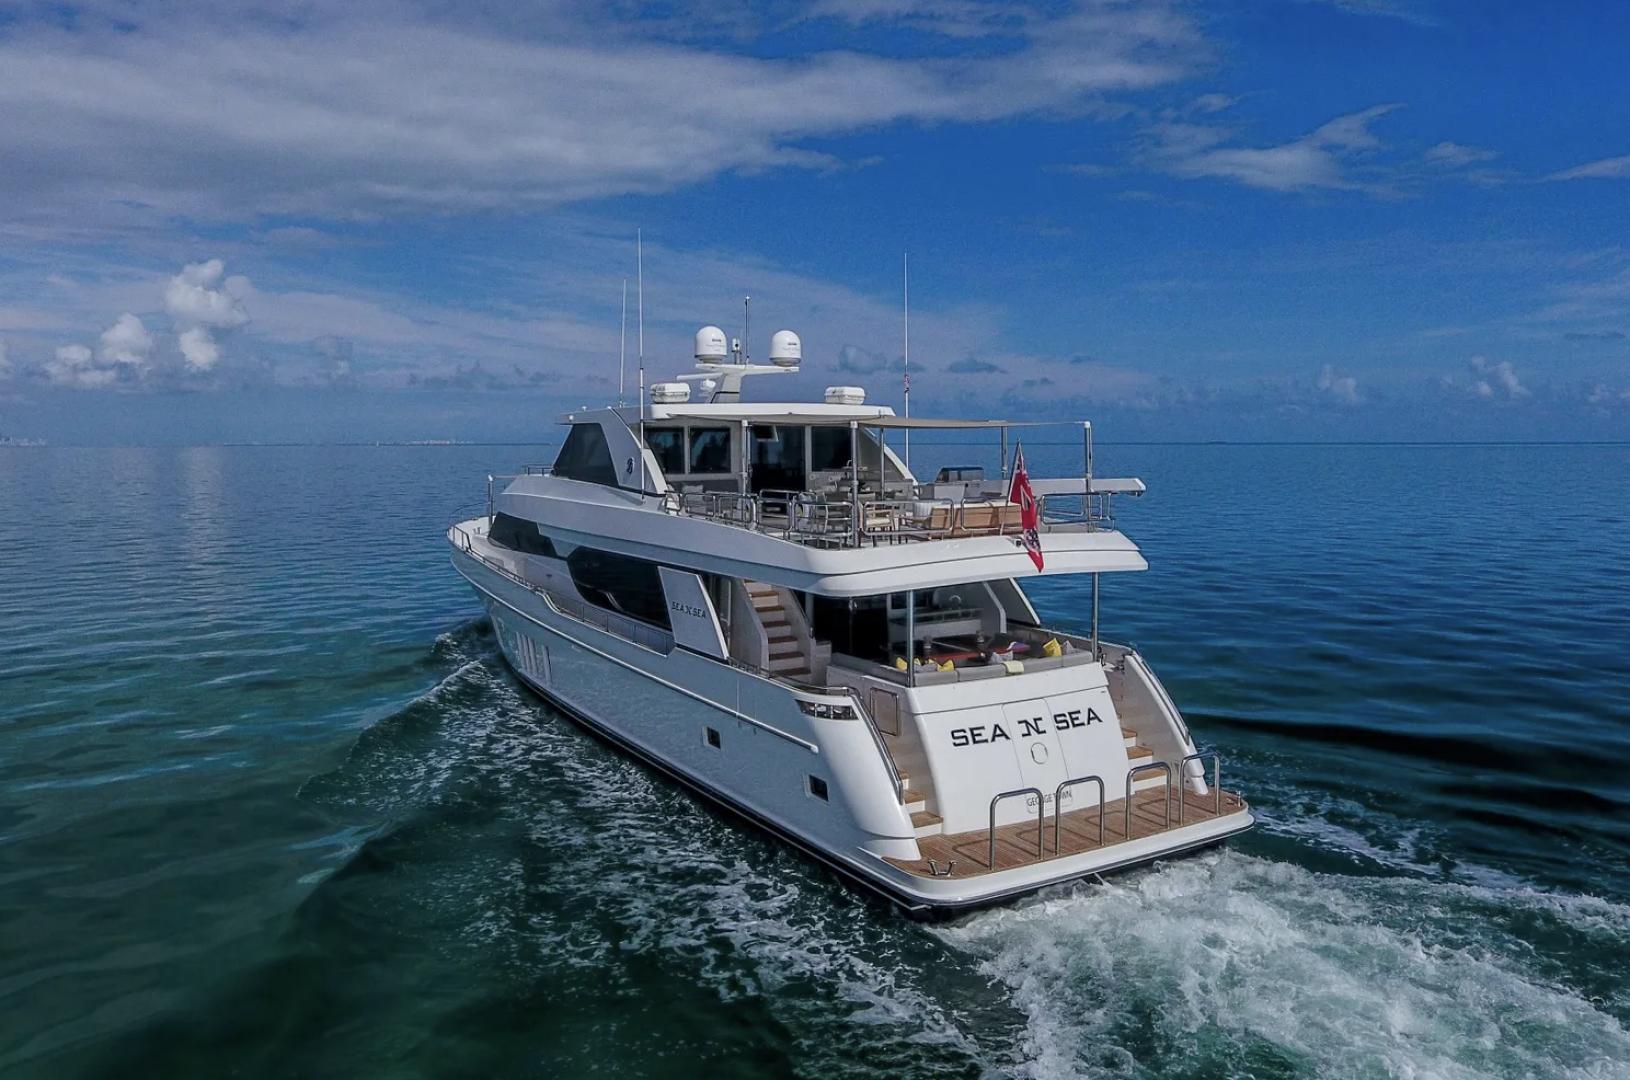 Ocean Alexander-100 Skylounge 2016-Sea N Sea Naples-Florida-United States-Stern View-1596366 | Thumbnail